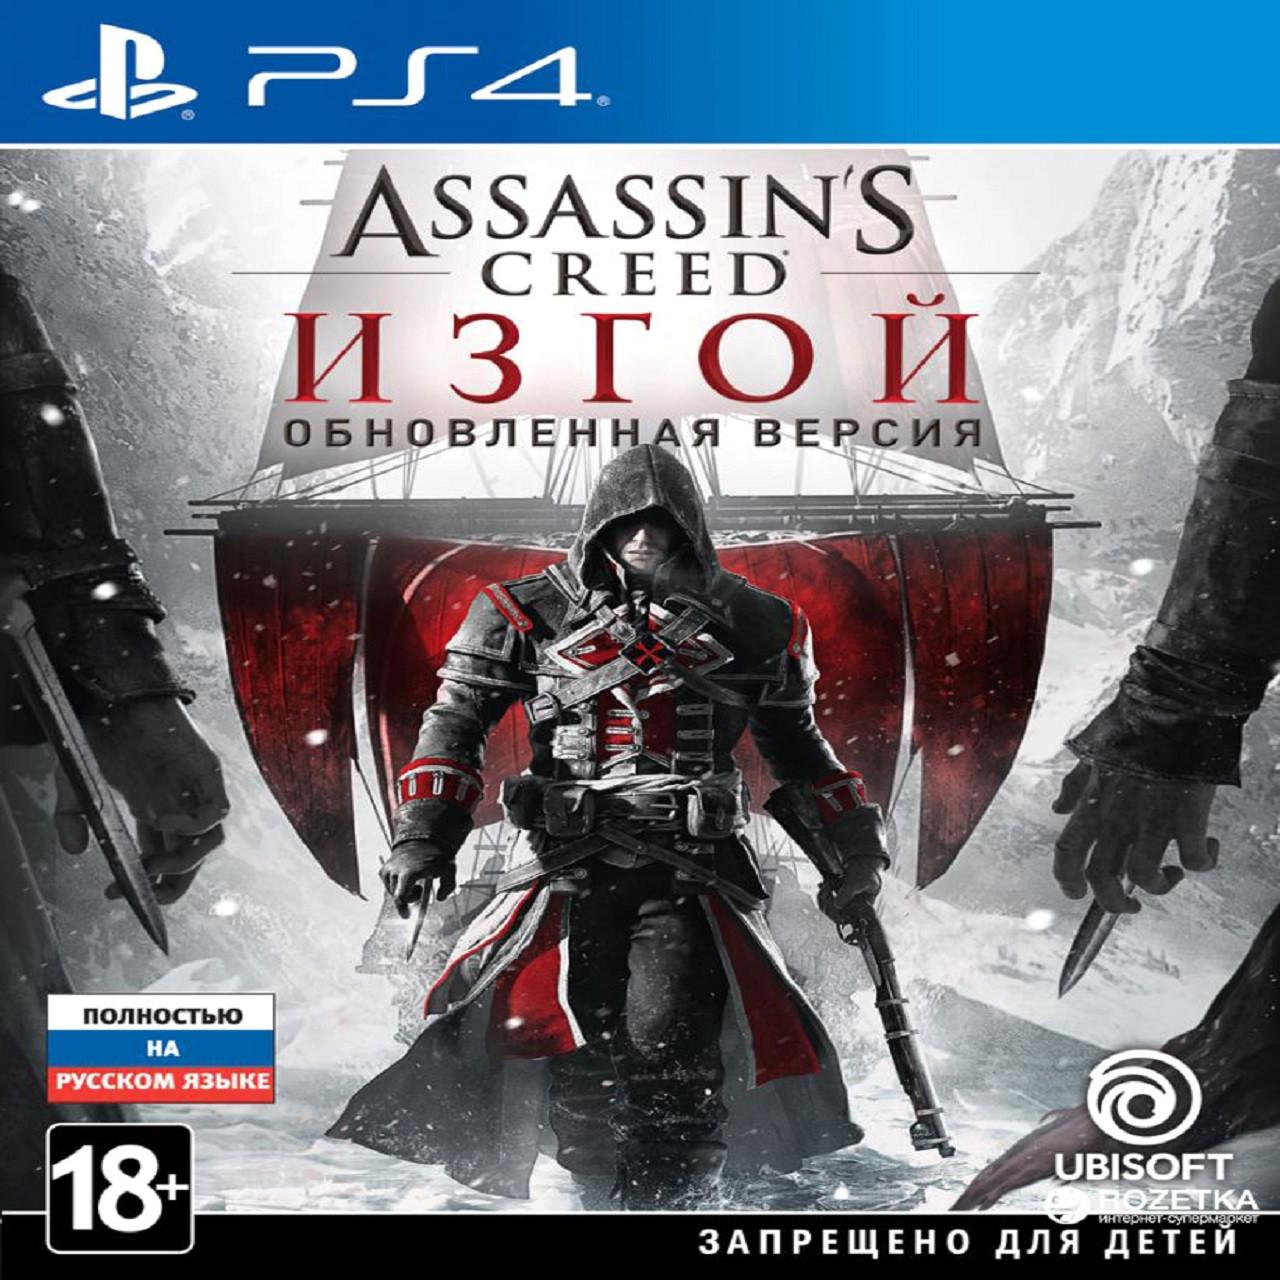 Assassin's Creed: Rogue RUS PS4 (NEW)